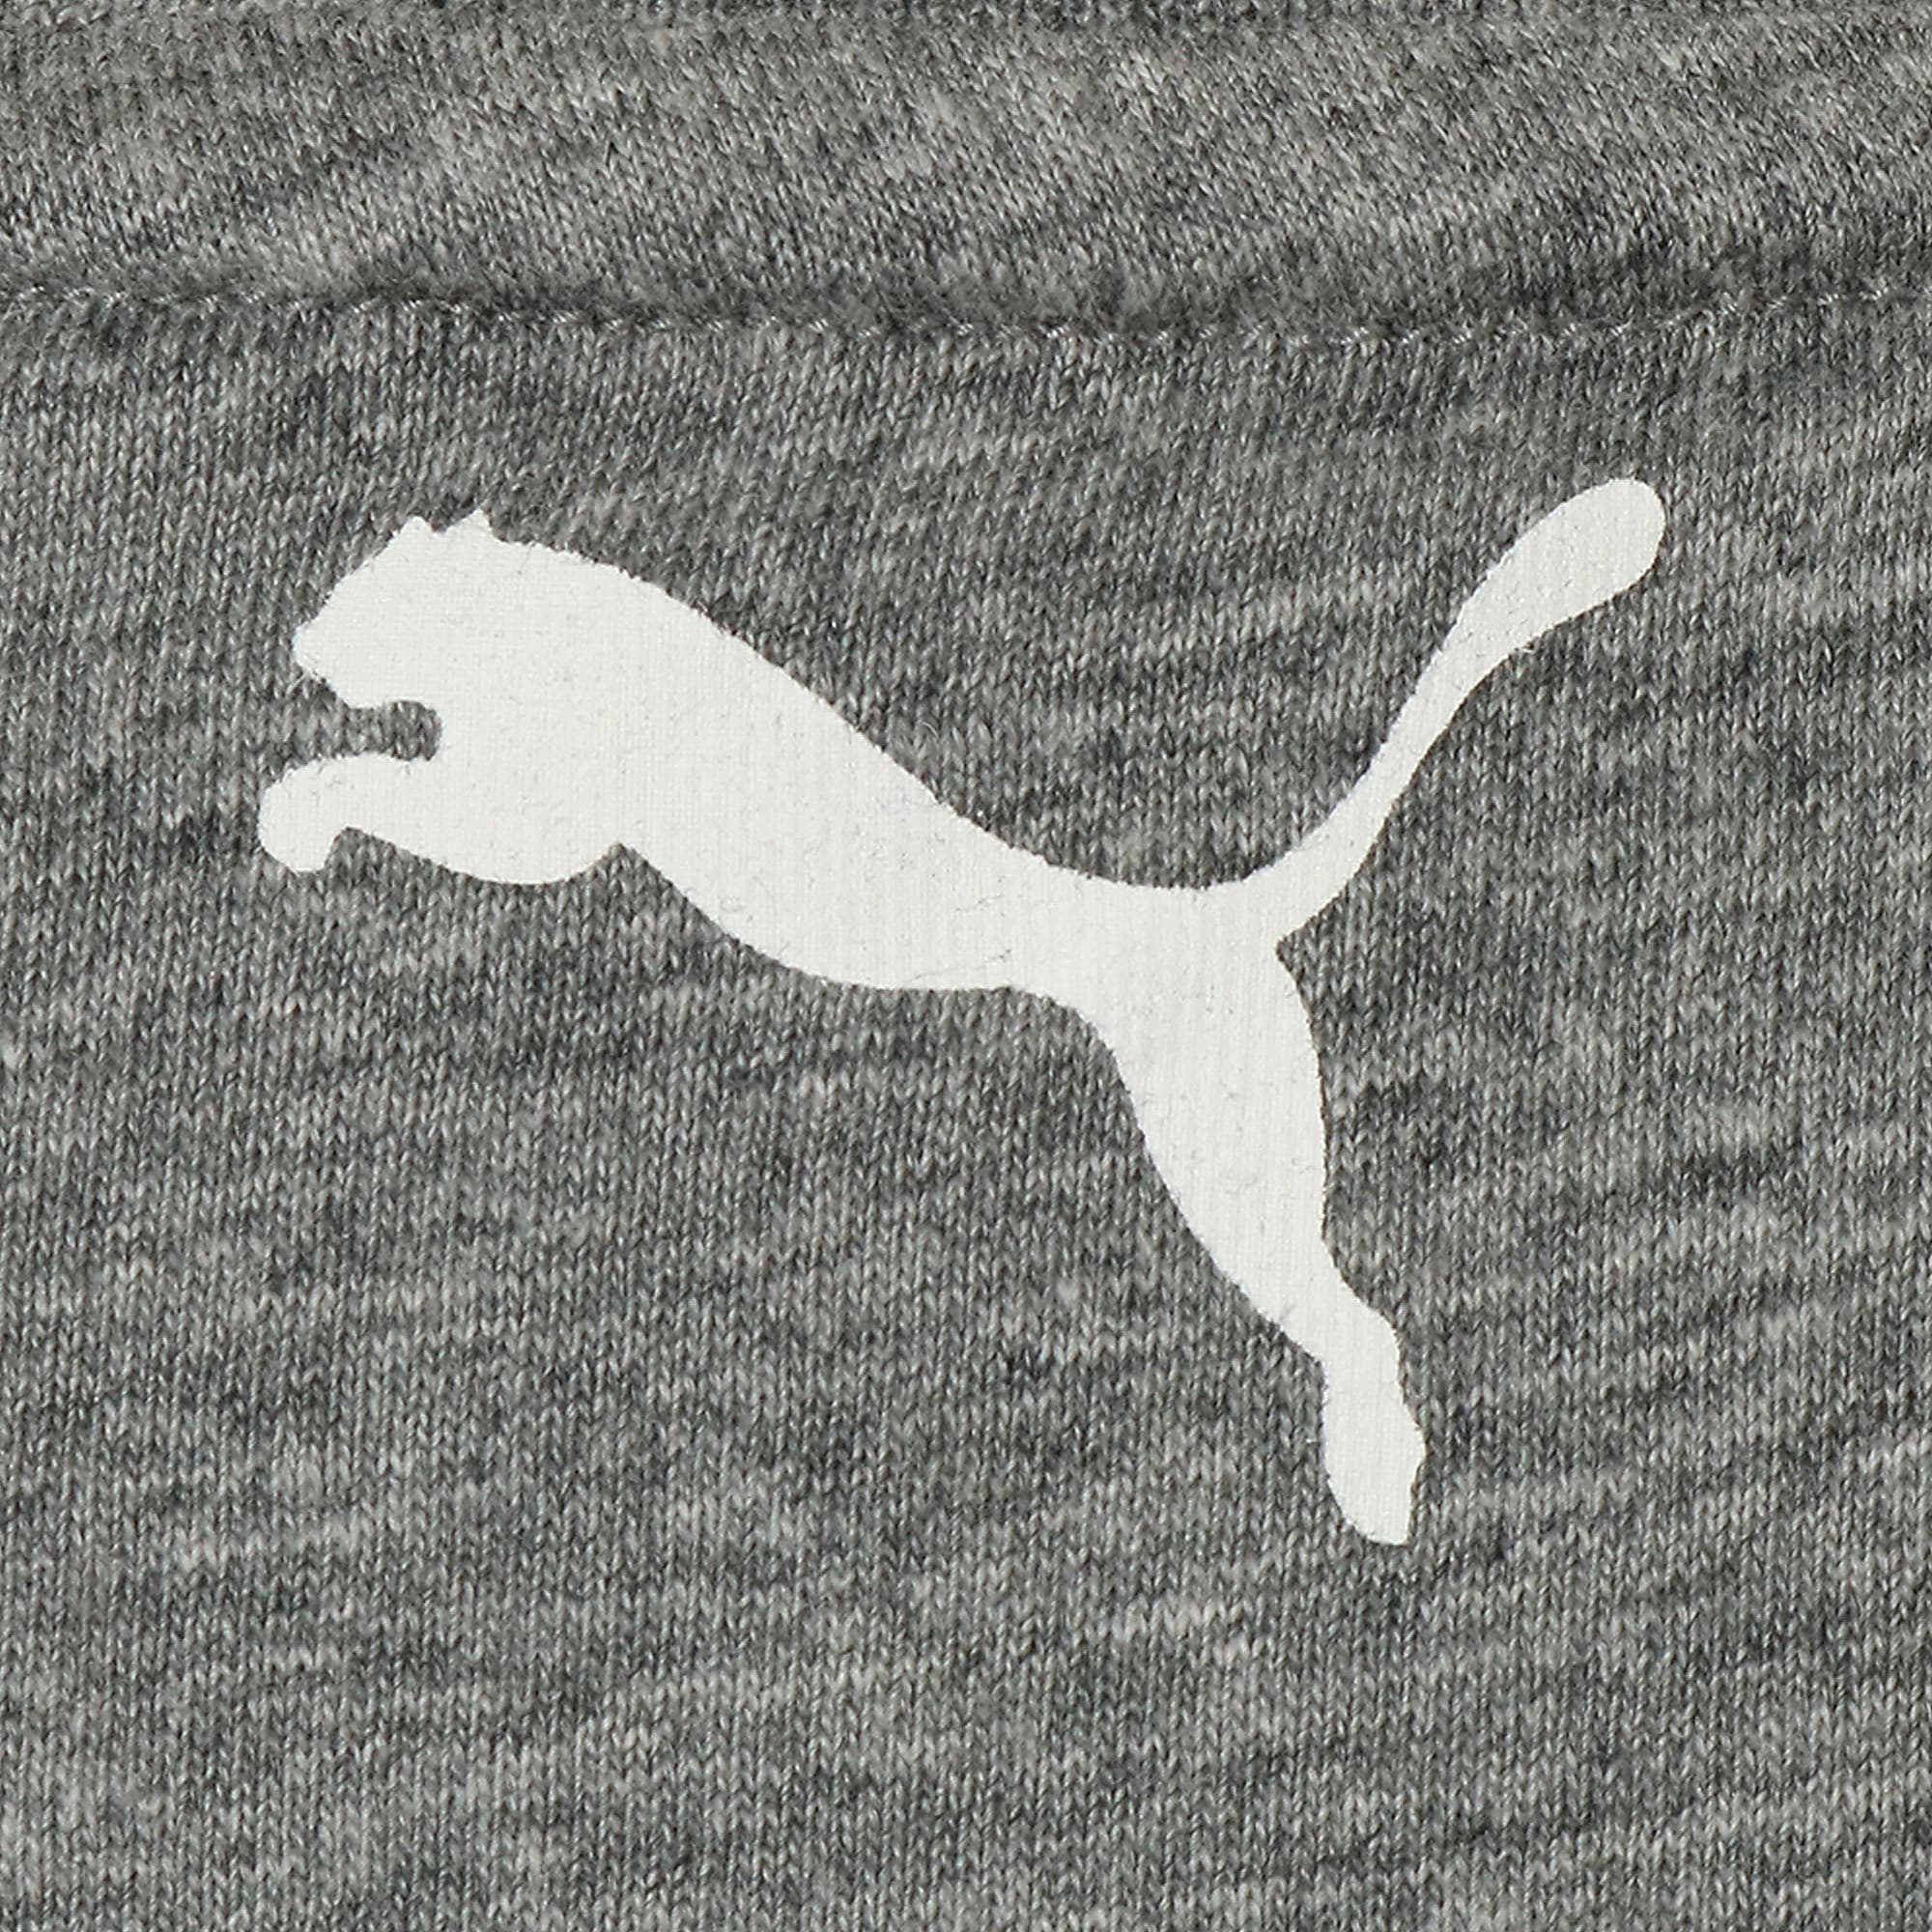 Thumbnail 4 of キッズ ALPHA SS グラフィック Tシャツ 半袖, Medium Gray Heather, medium-JPN